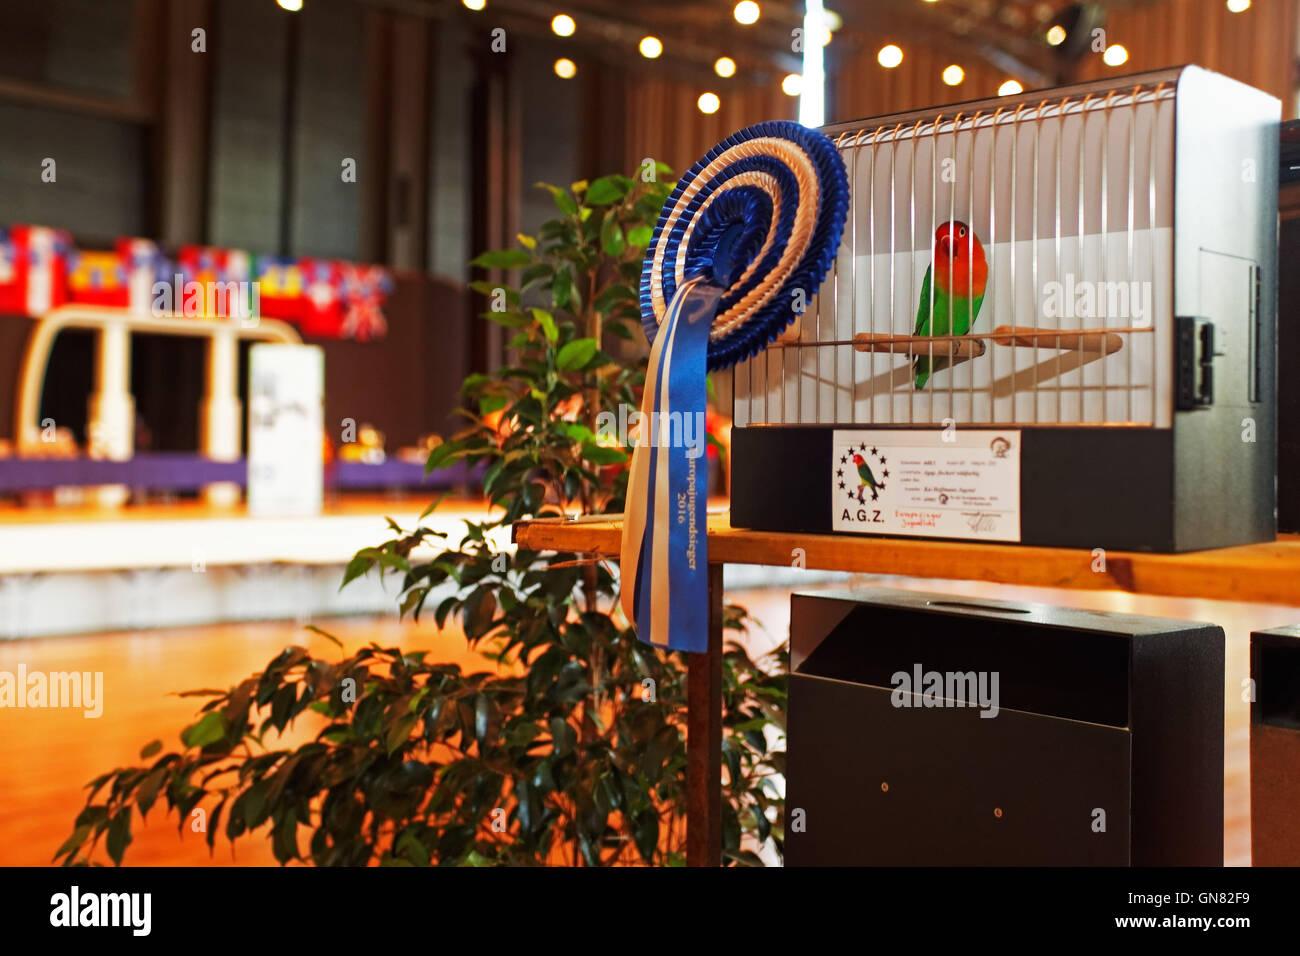 AZ Europa Championat, Karlsruhe, Baden-Württemberg, Deutschland - Stock Image